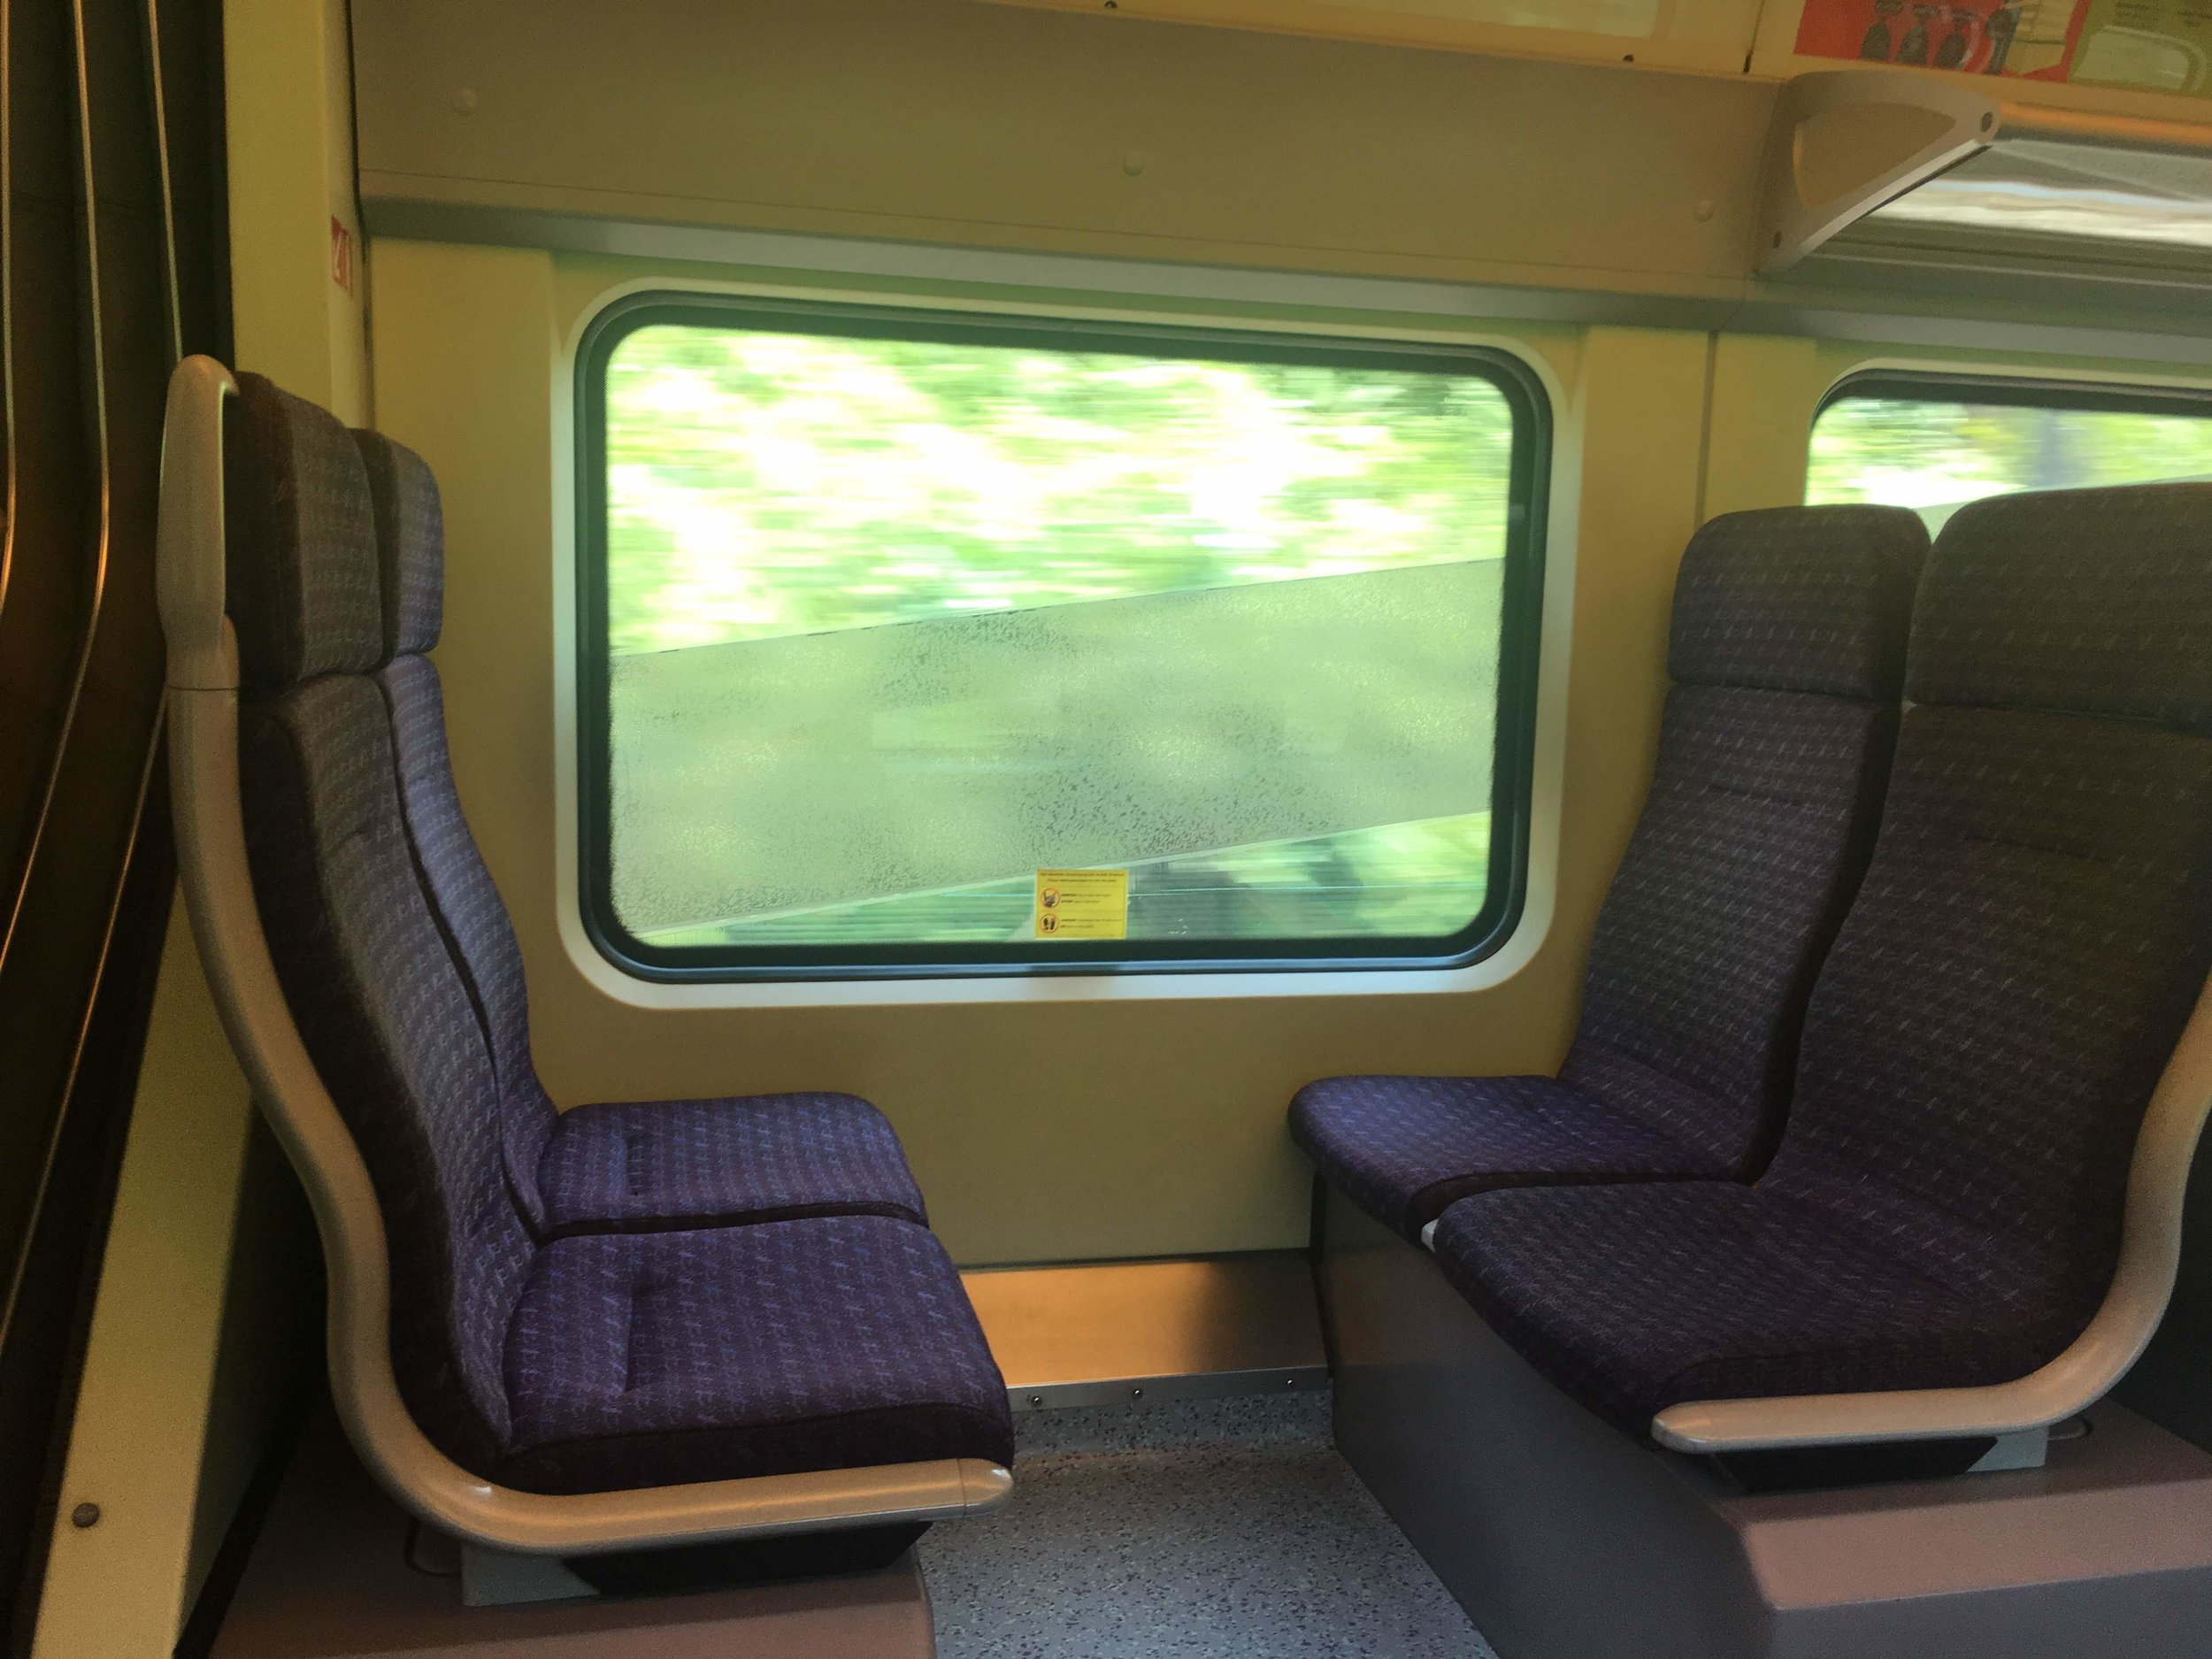 riding the KLIA Transit train from Kuala Lumpur, Malyasia to Putrajaya